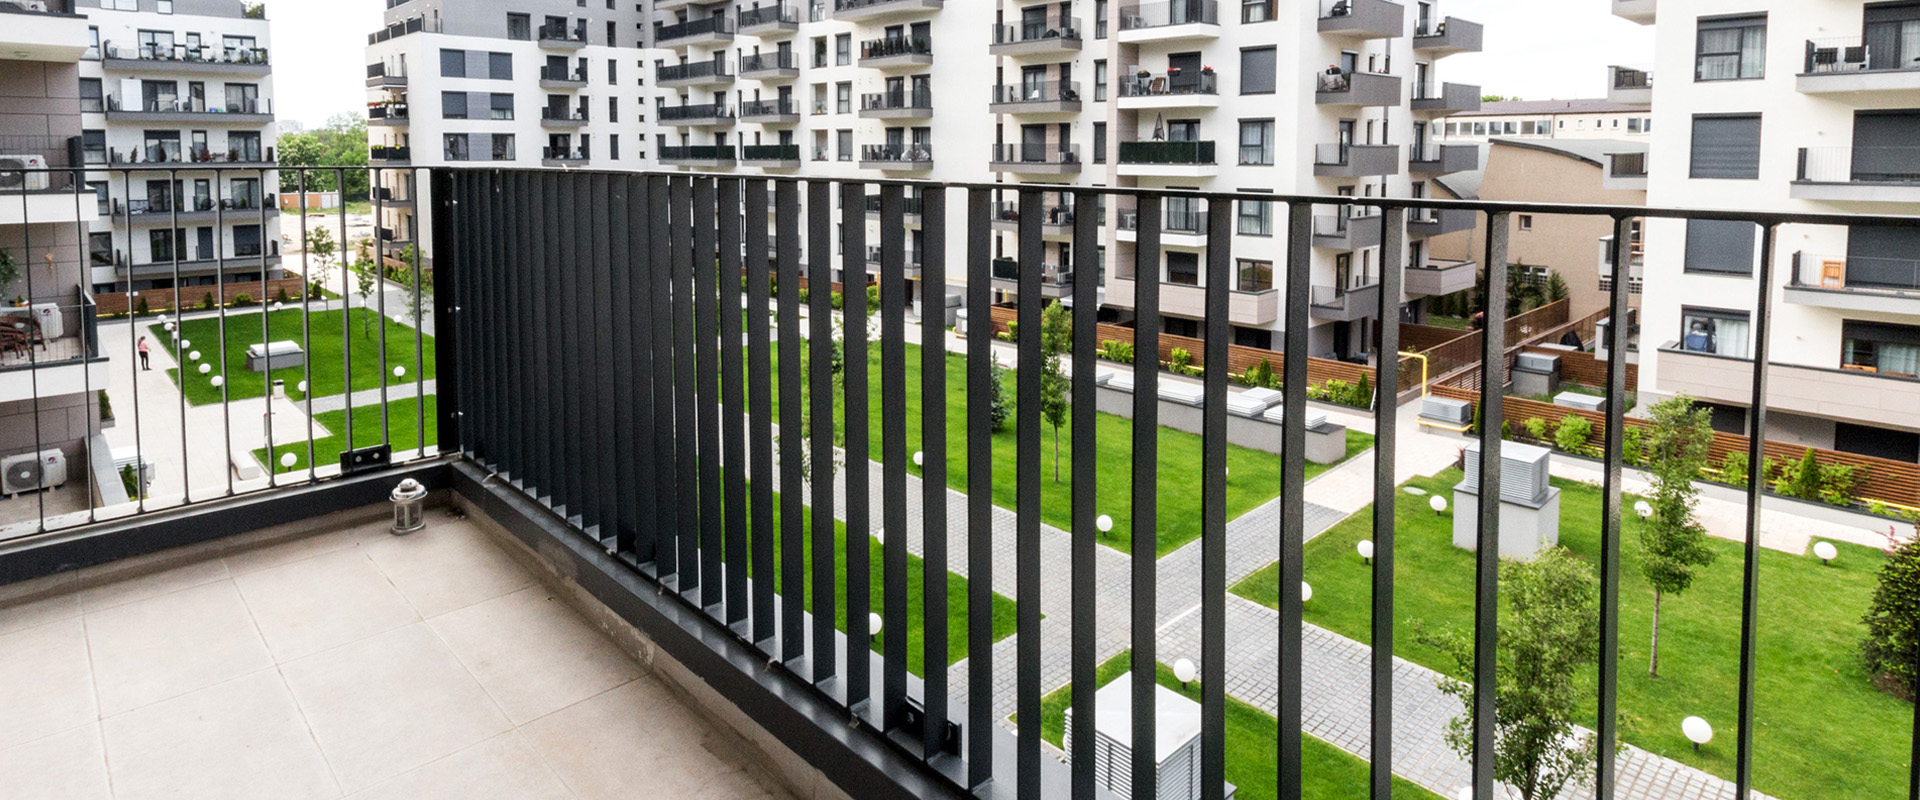 Vanzare apartament 3 camere   Vedere curte interioara, Mobilat   Arcadia [ID: 1200212]